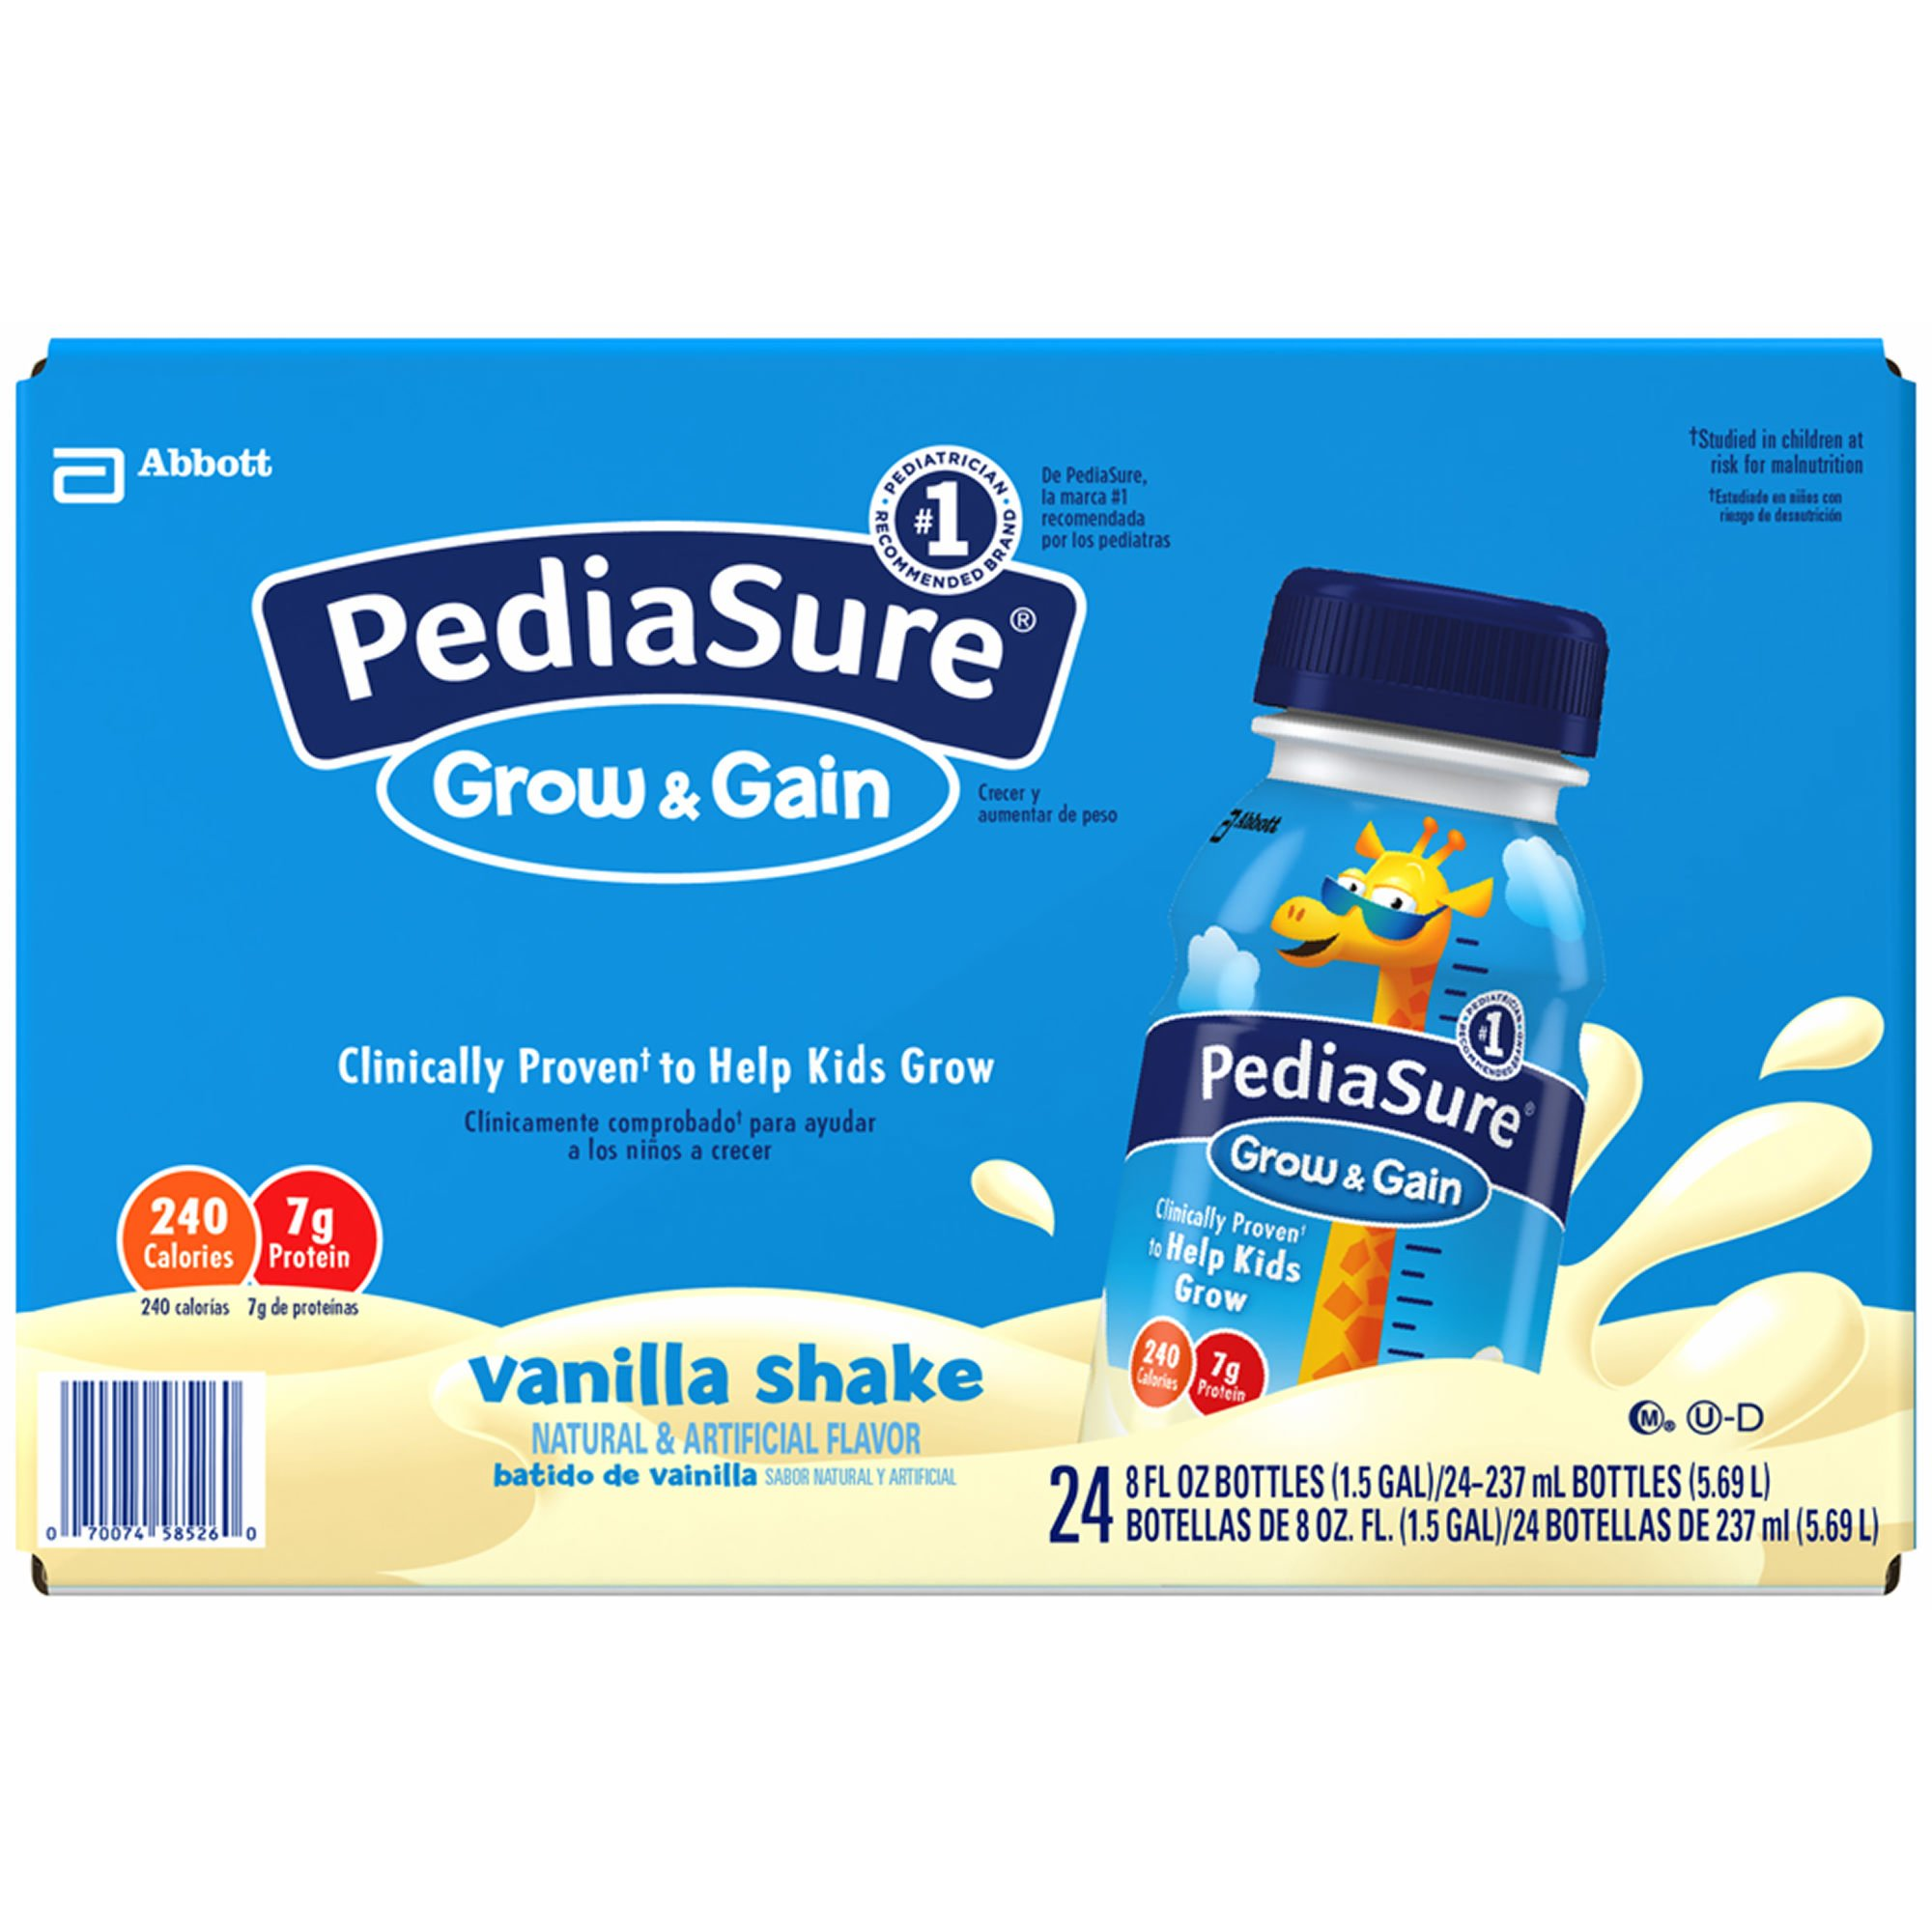 PediaSure Vanilla Shake, 24 pk./8 oz. (pack of 6) by Pediasure (Image #1)